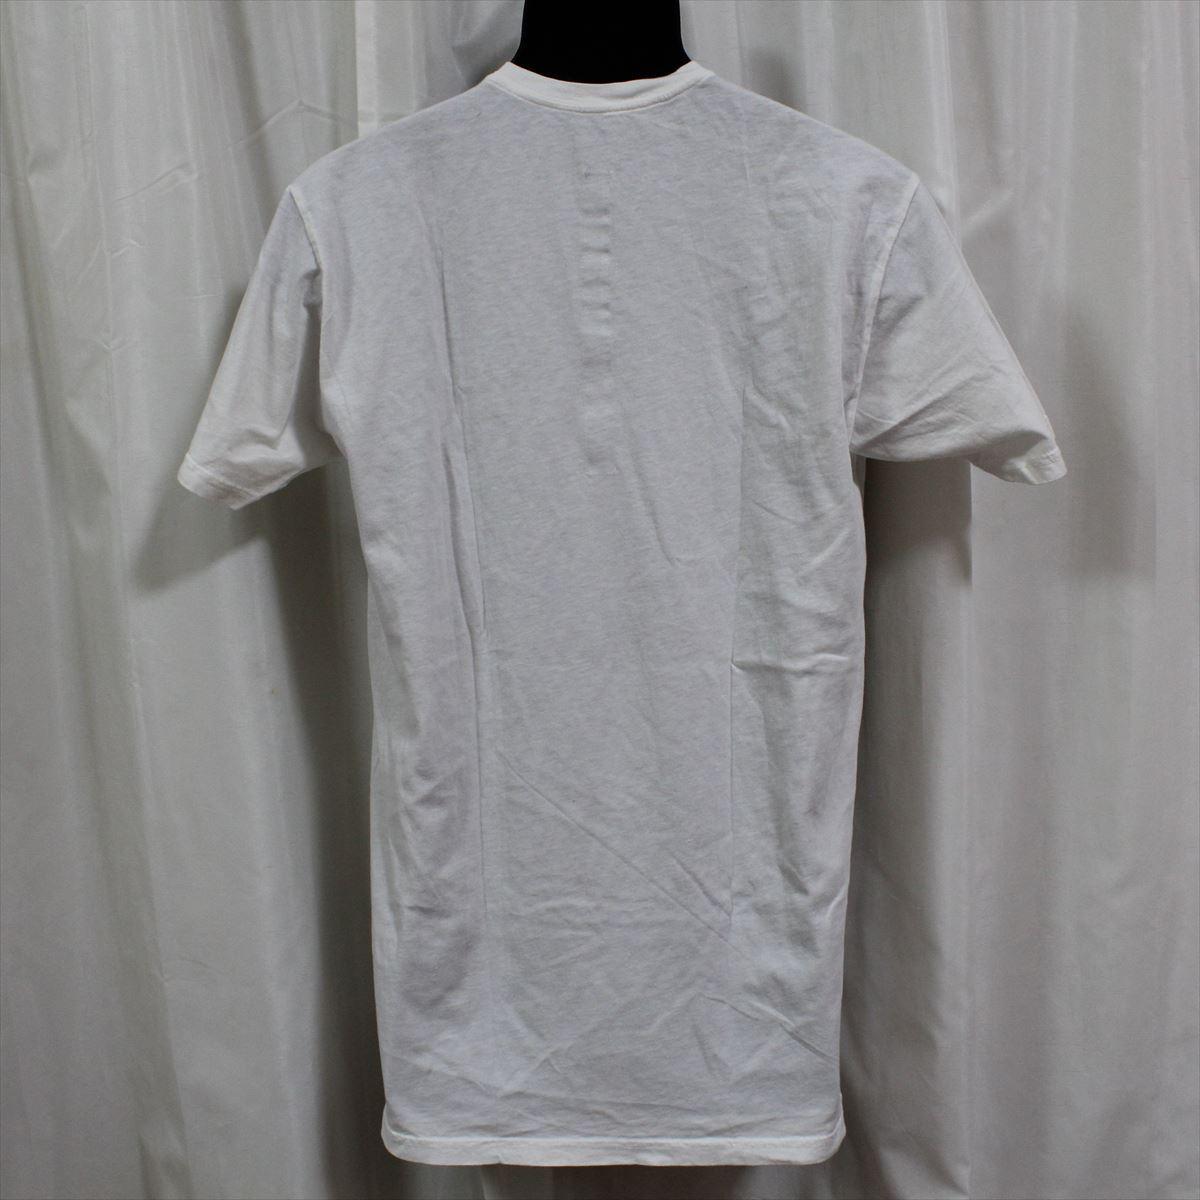 EFU メンズ半袖Tシャツ ホワイト 海外サイズのS ロング丈 新品 カナダ製_画像3